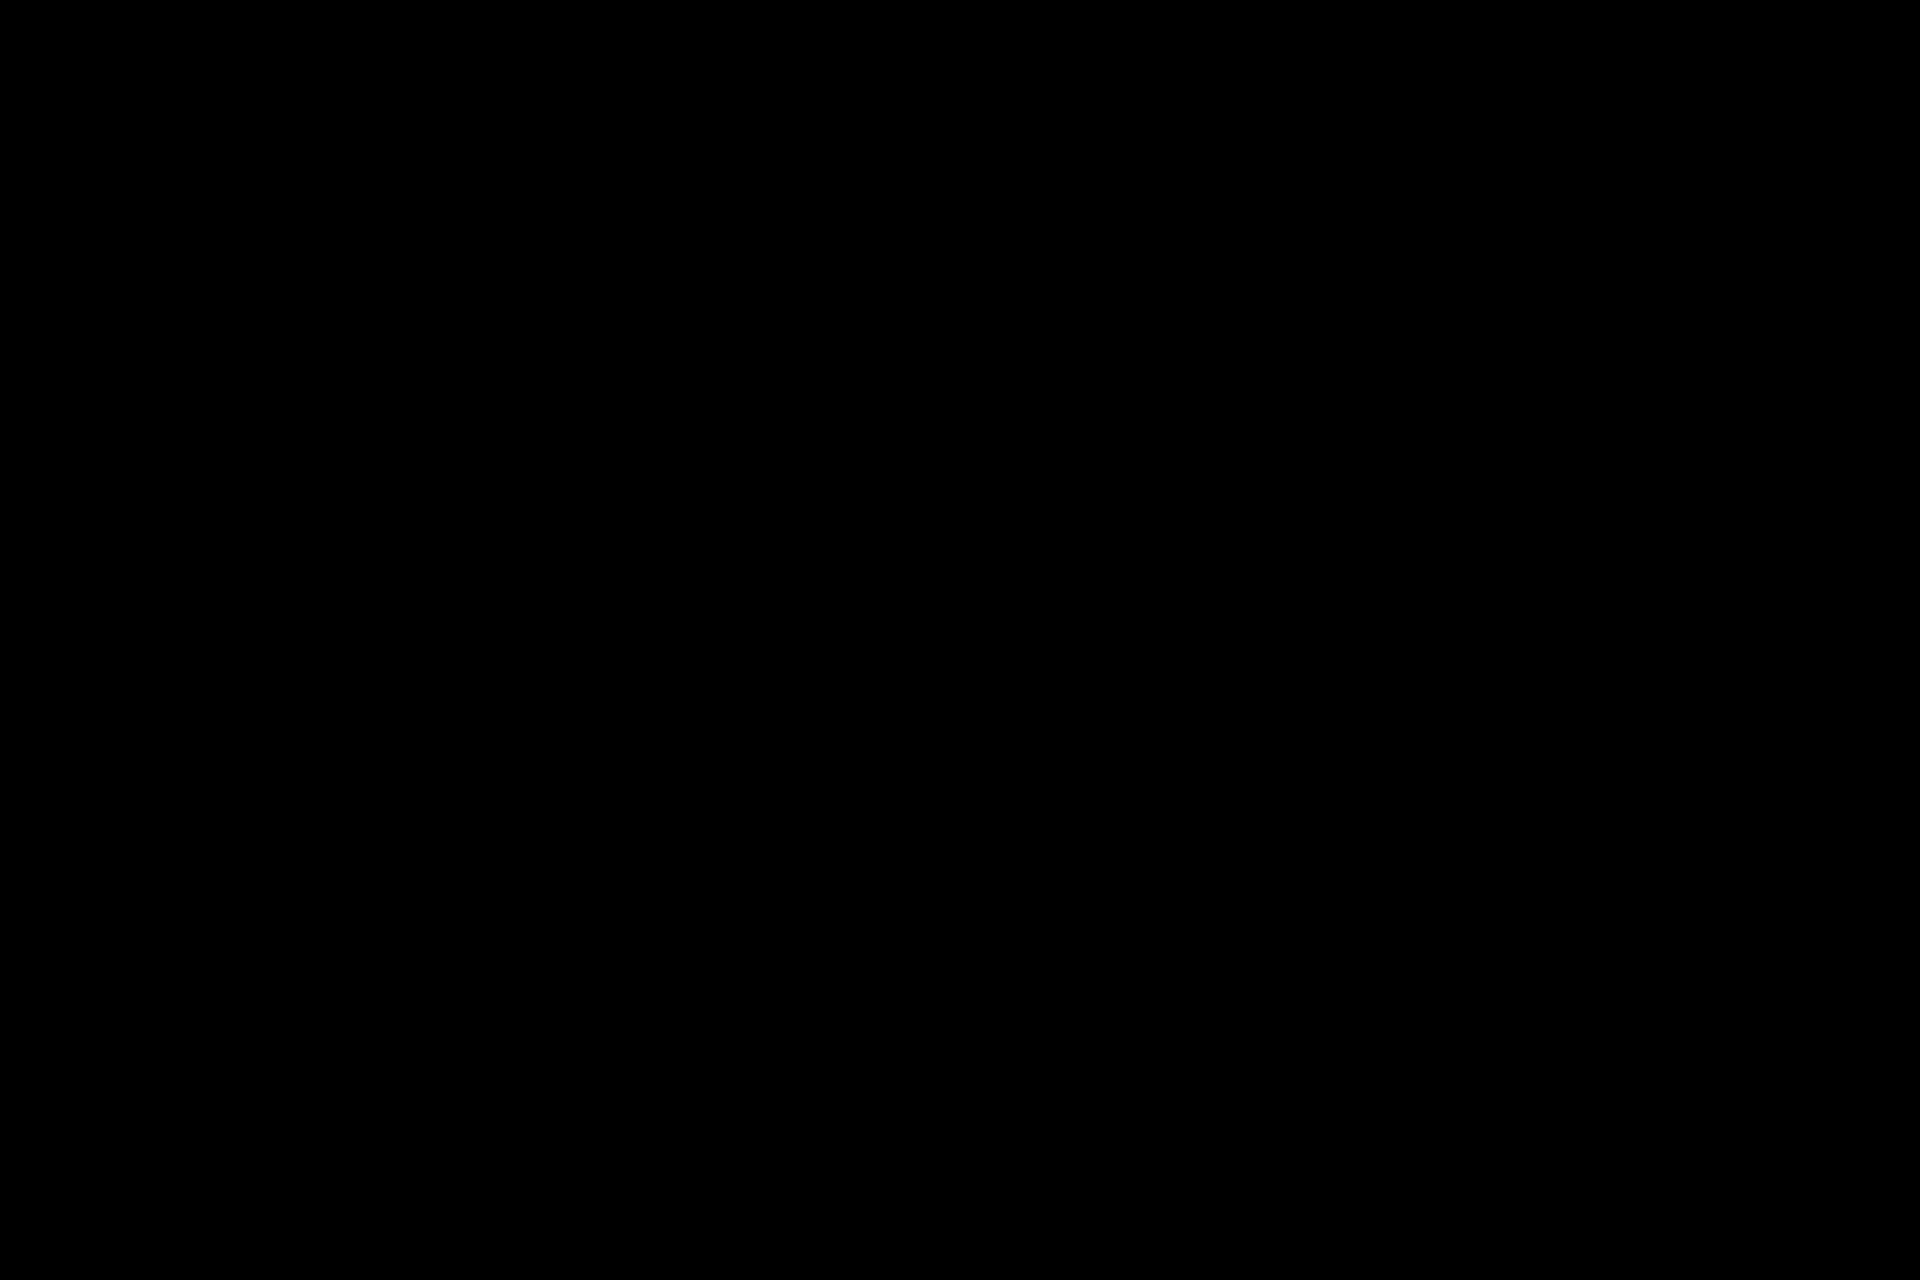 zwei Personen - Icon